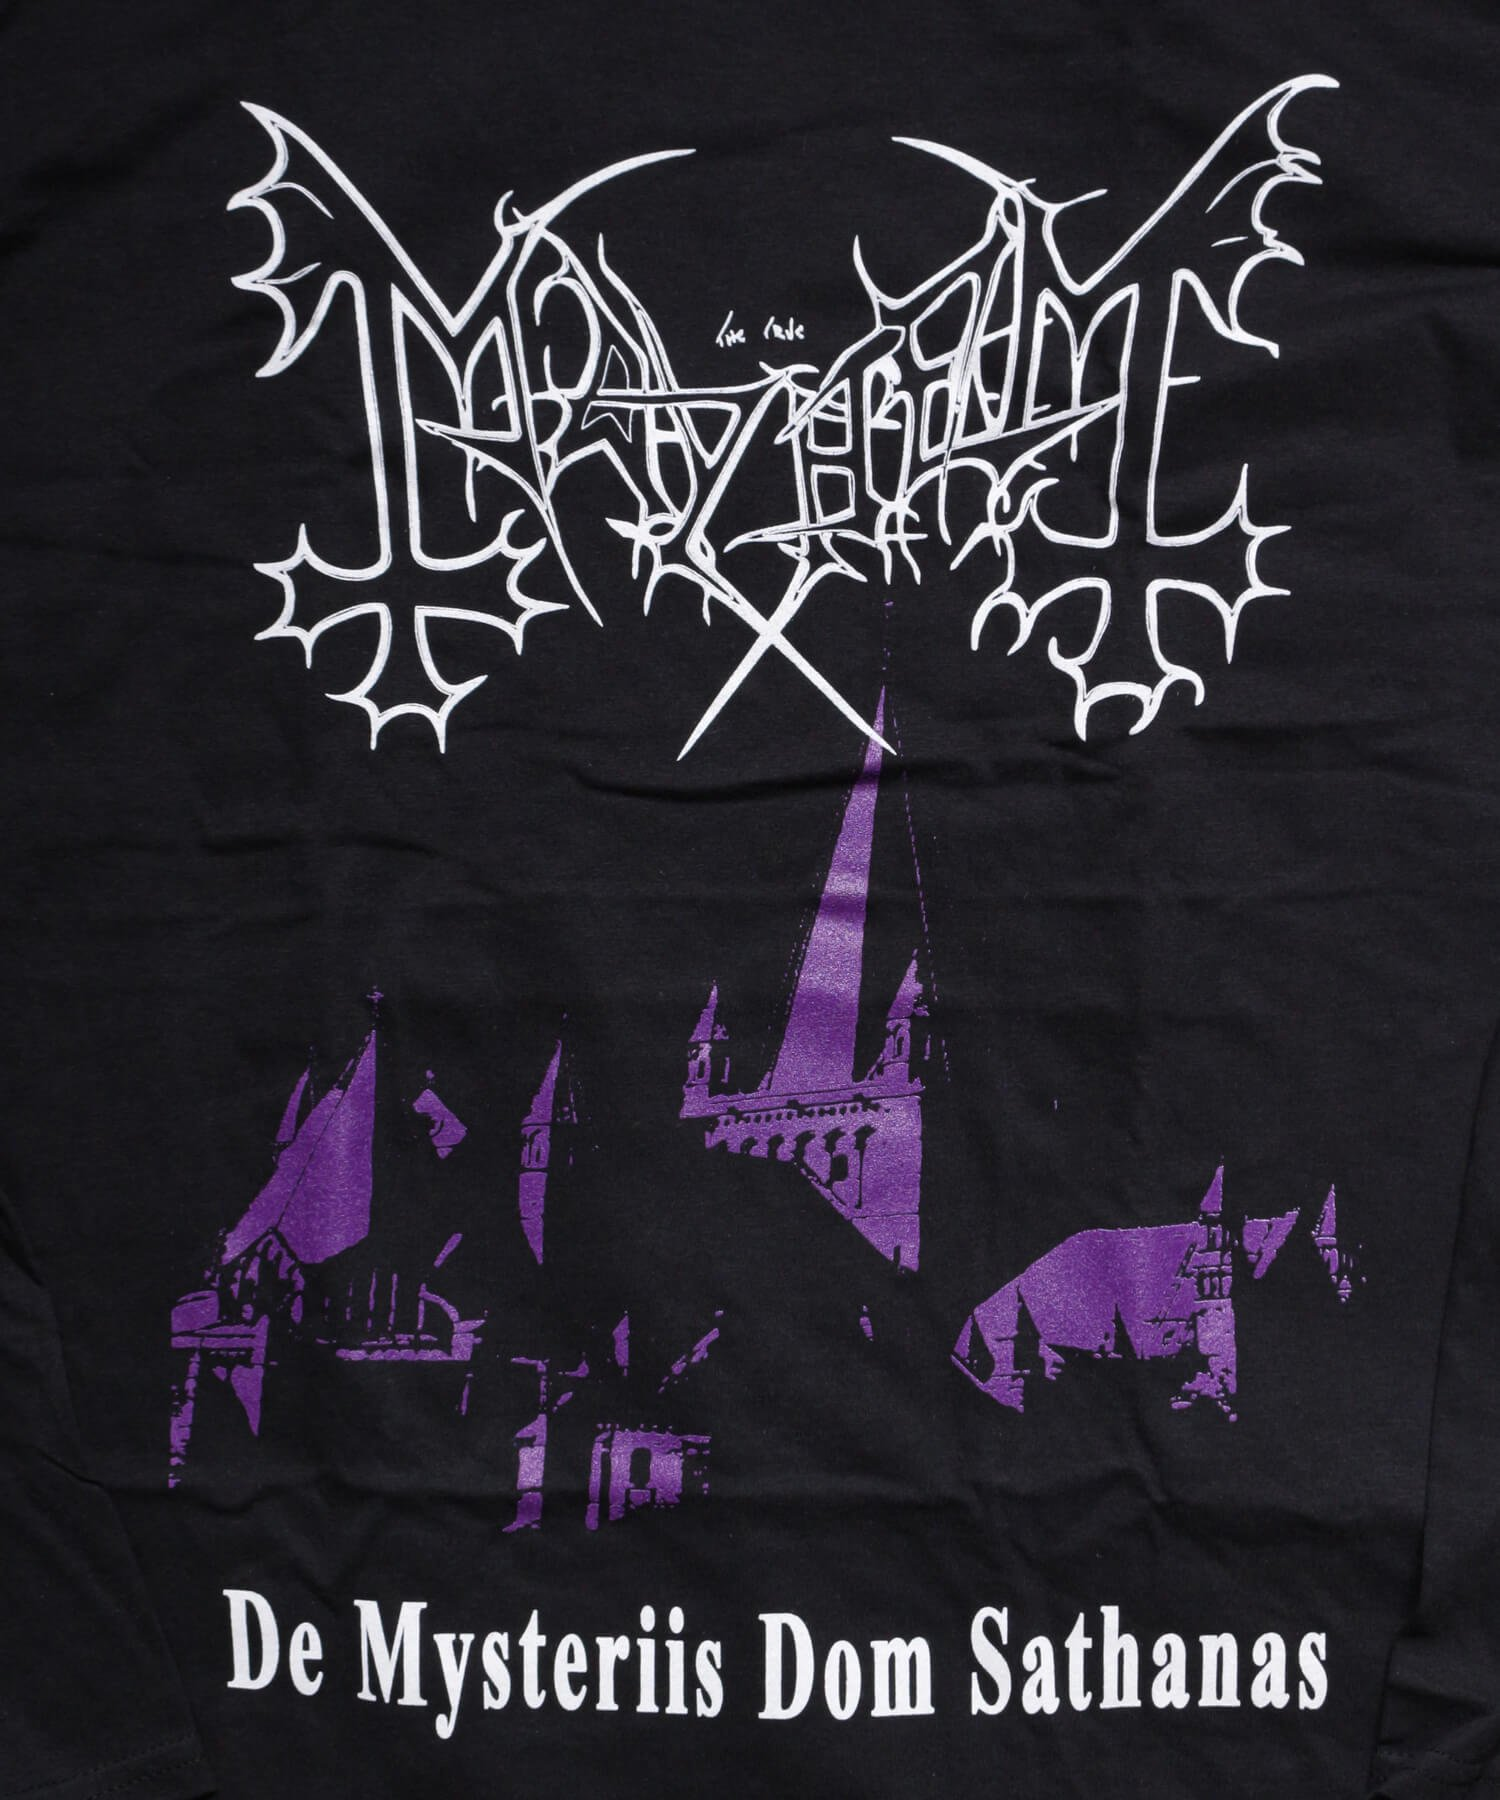 Official Artist Goods / バンドTなど |MAYHEM / メイヘム:DE MYSTERIIS DOM SATHANAS LONG SLEEVE SHIRT (BLACK) 商品画像3